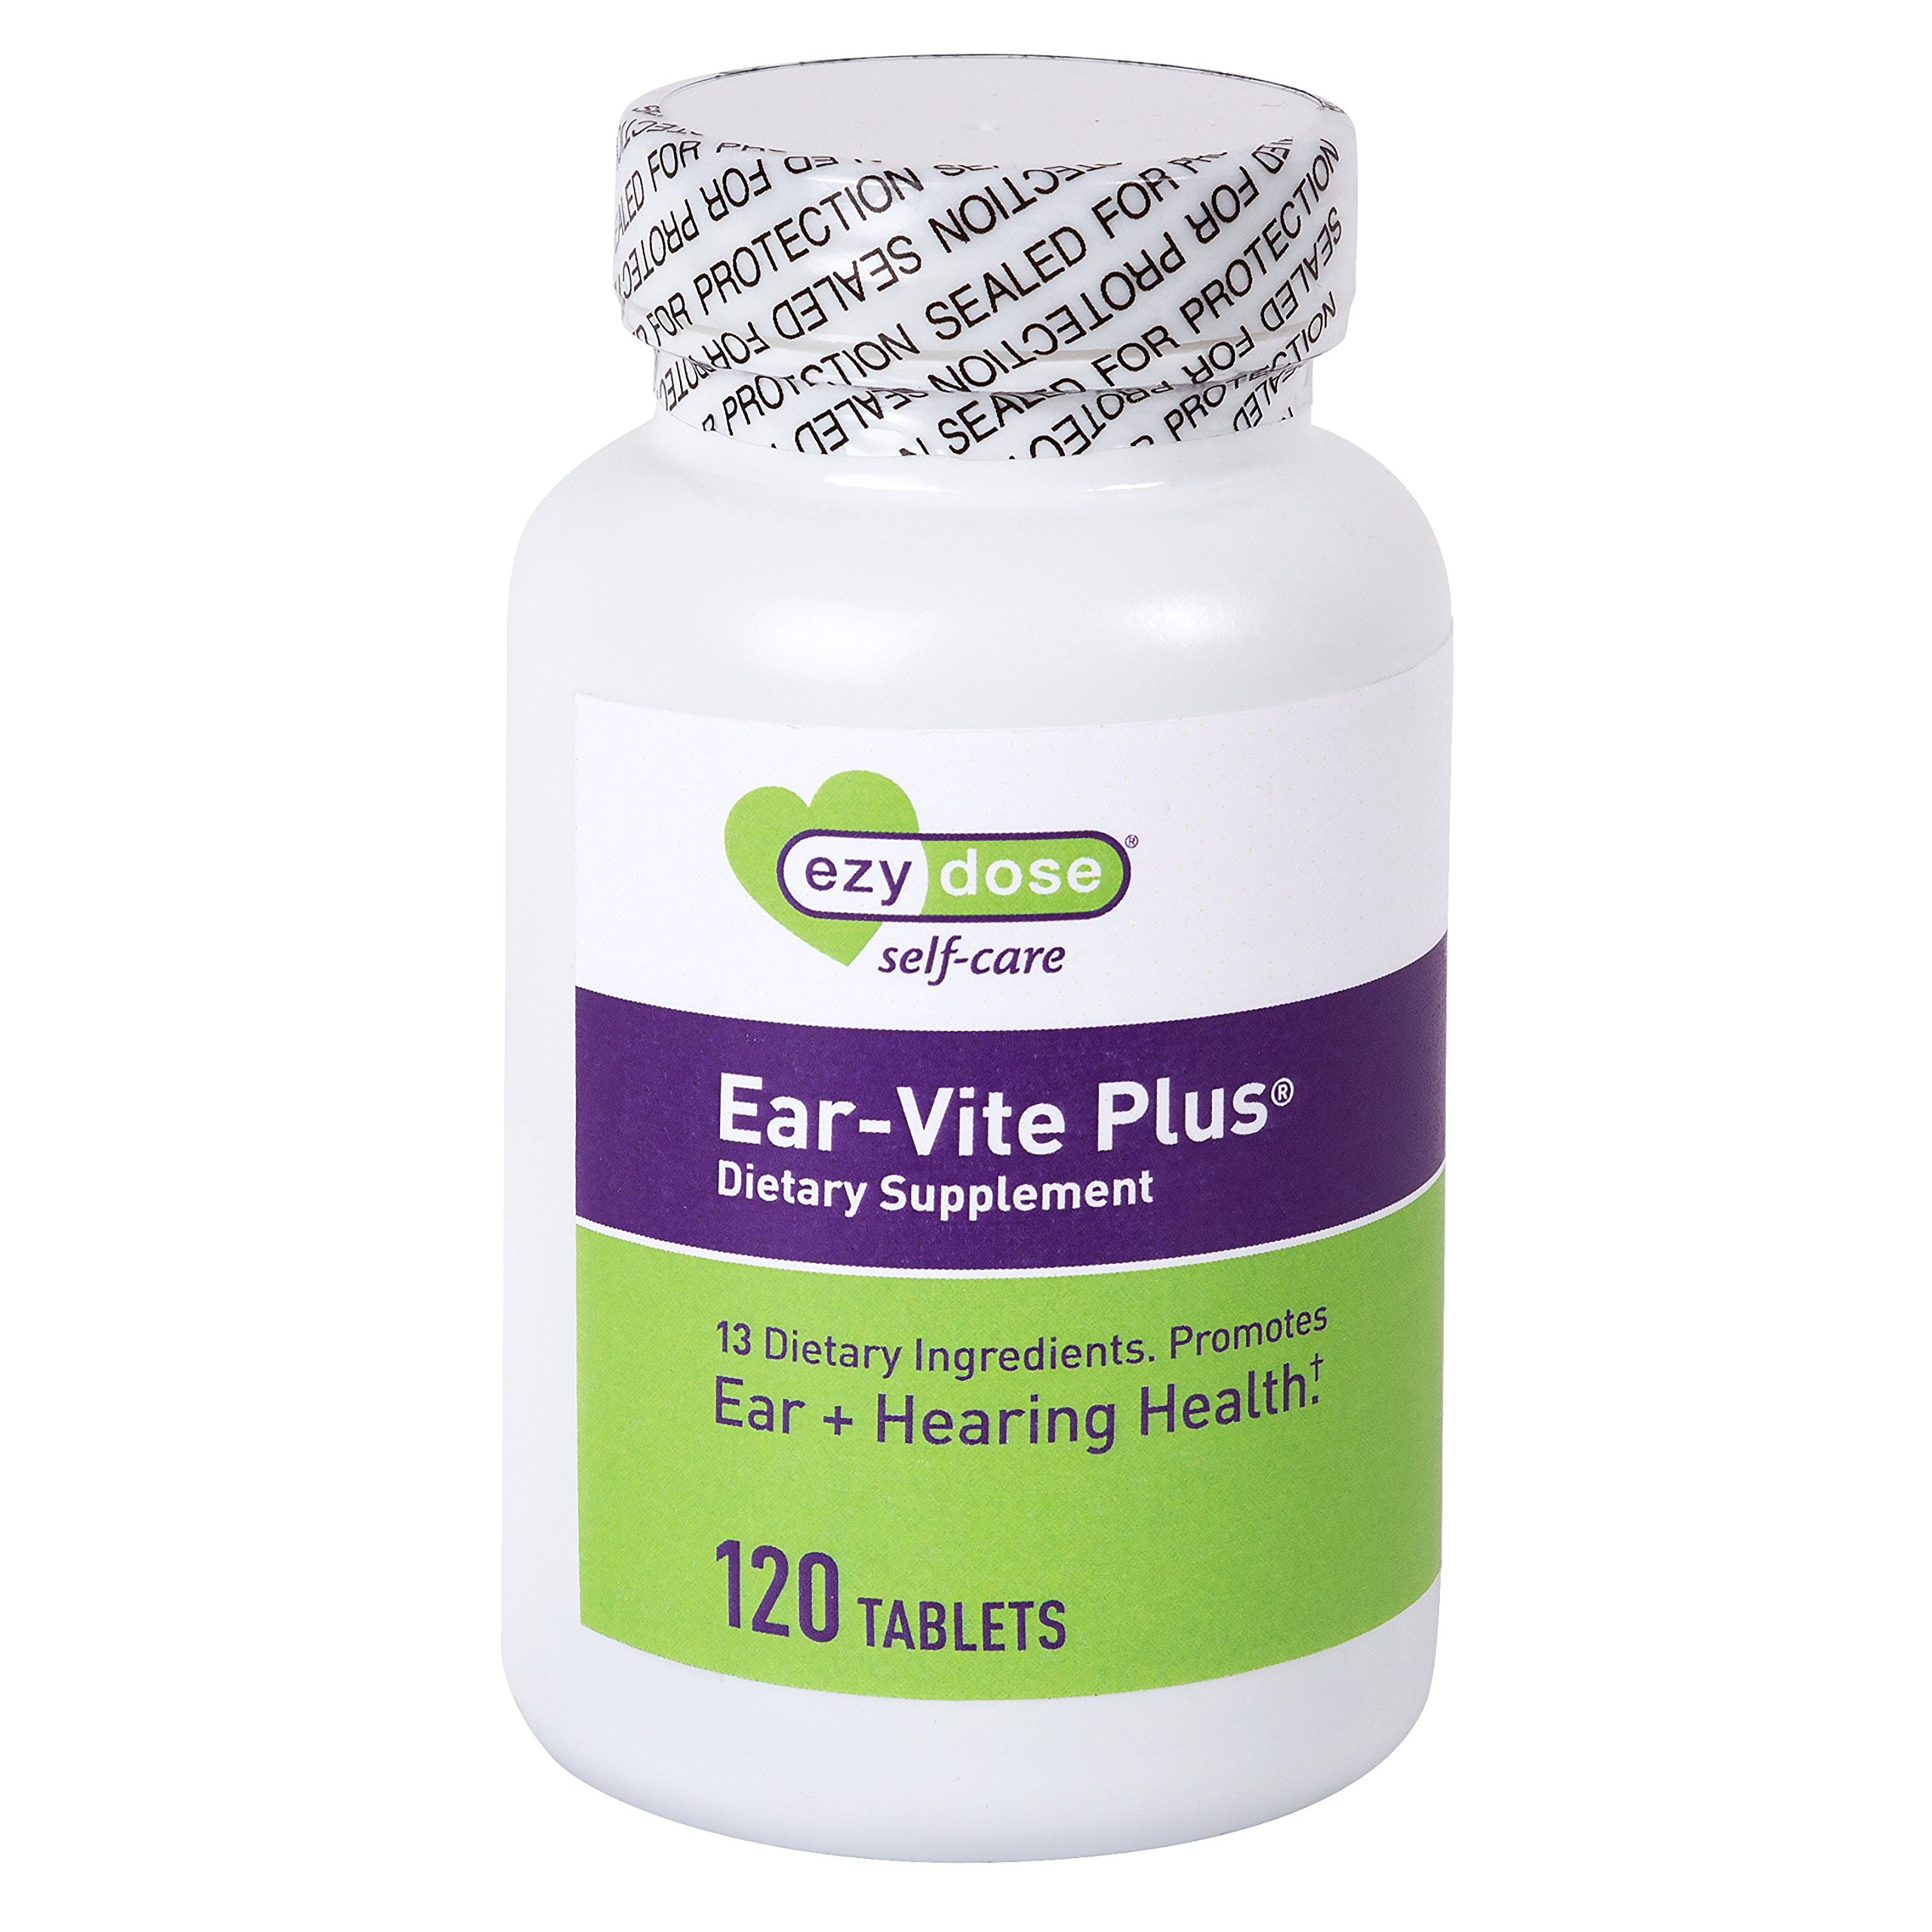 Ear-Vite Plus Dietary Supplement 120 tablets